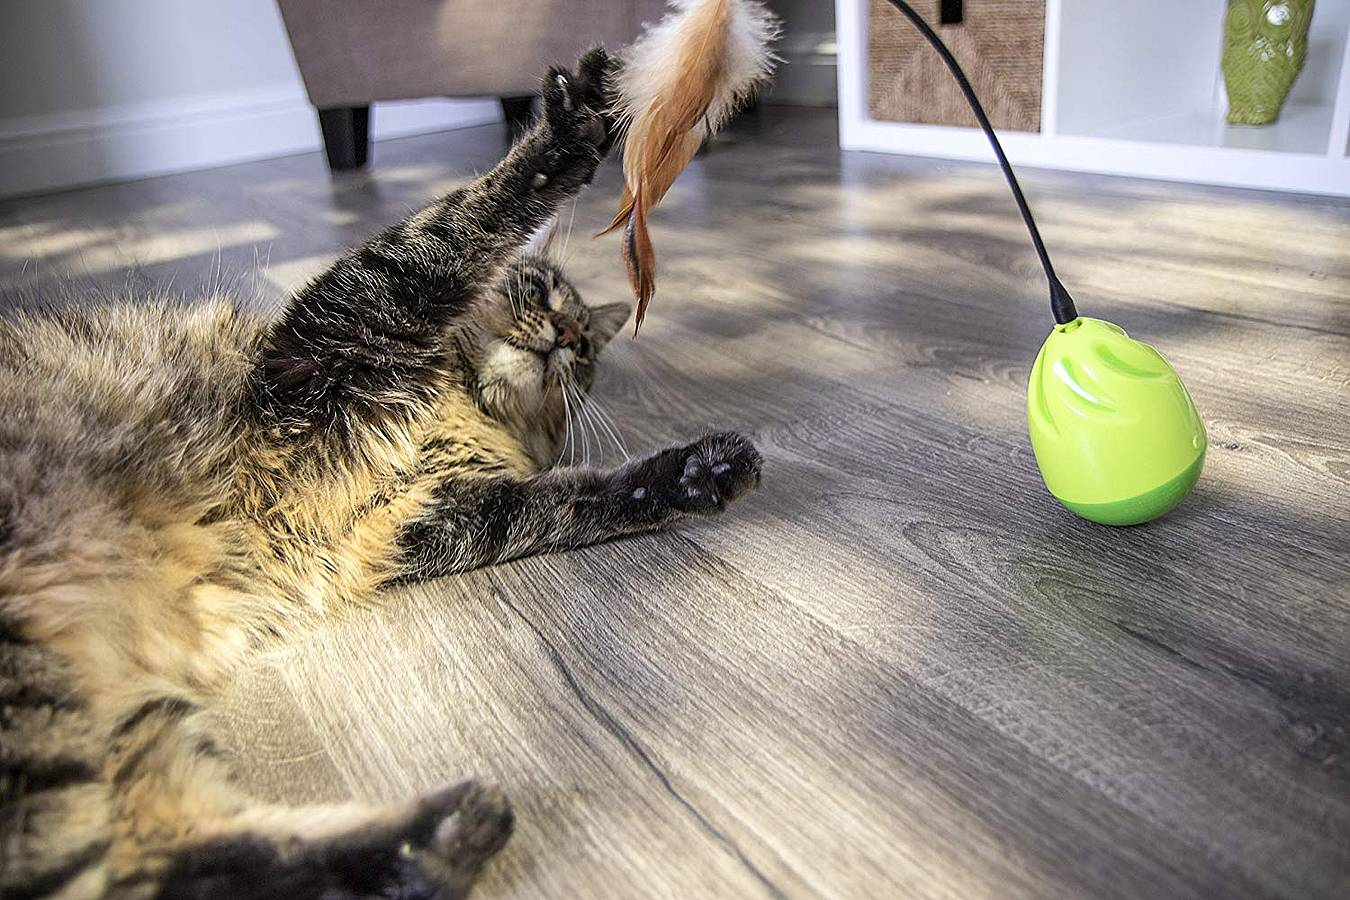 Mejores juguetes interactivos para gatos